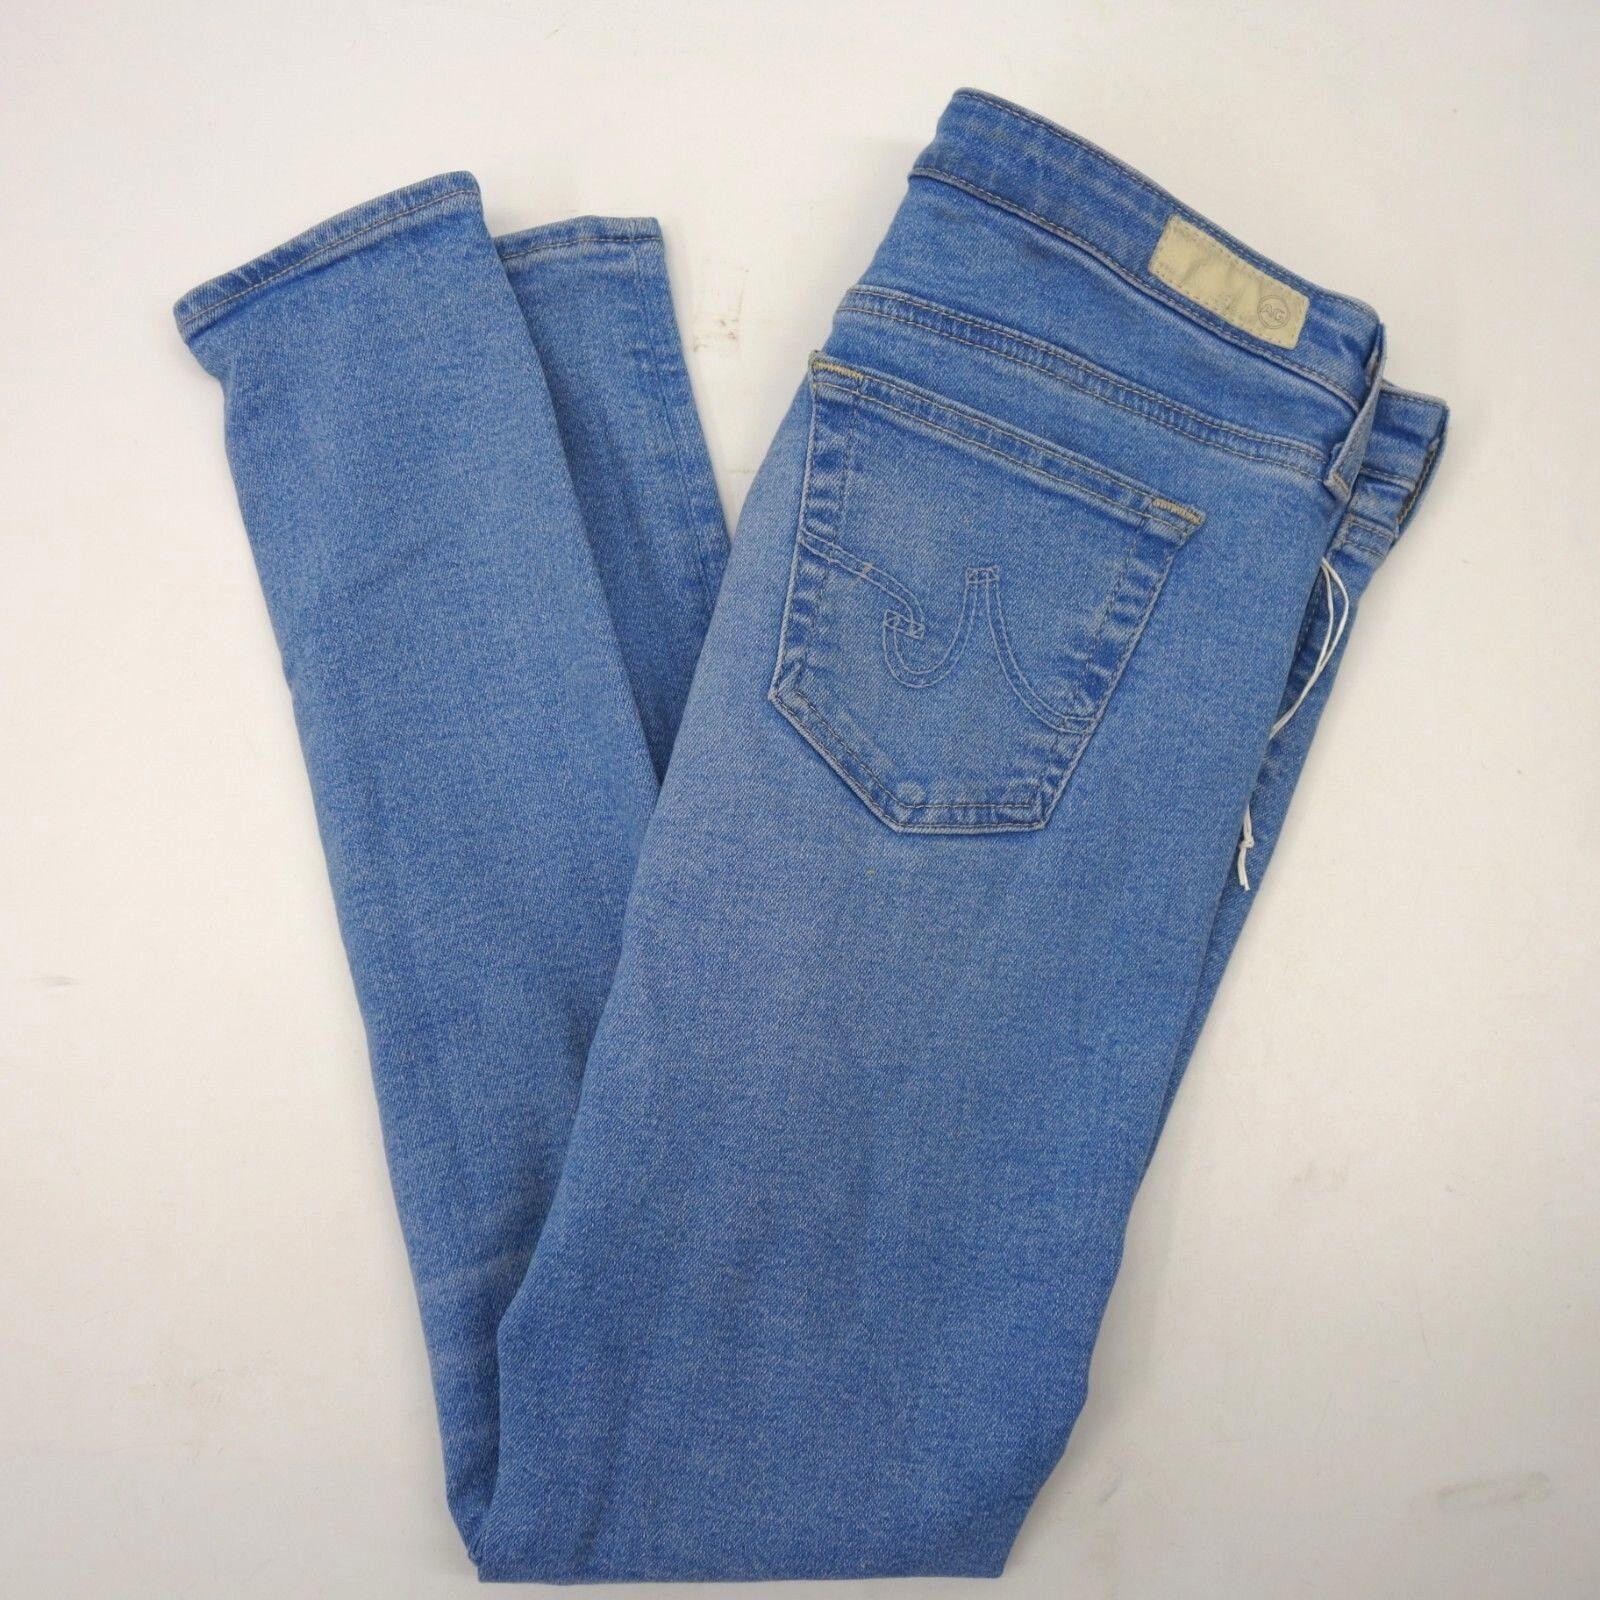 Neu Ag Adriano Goldschmied Damen Super Enge Leggings Knöchel Jeans USA 27